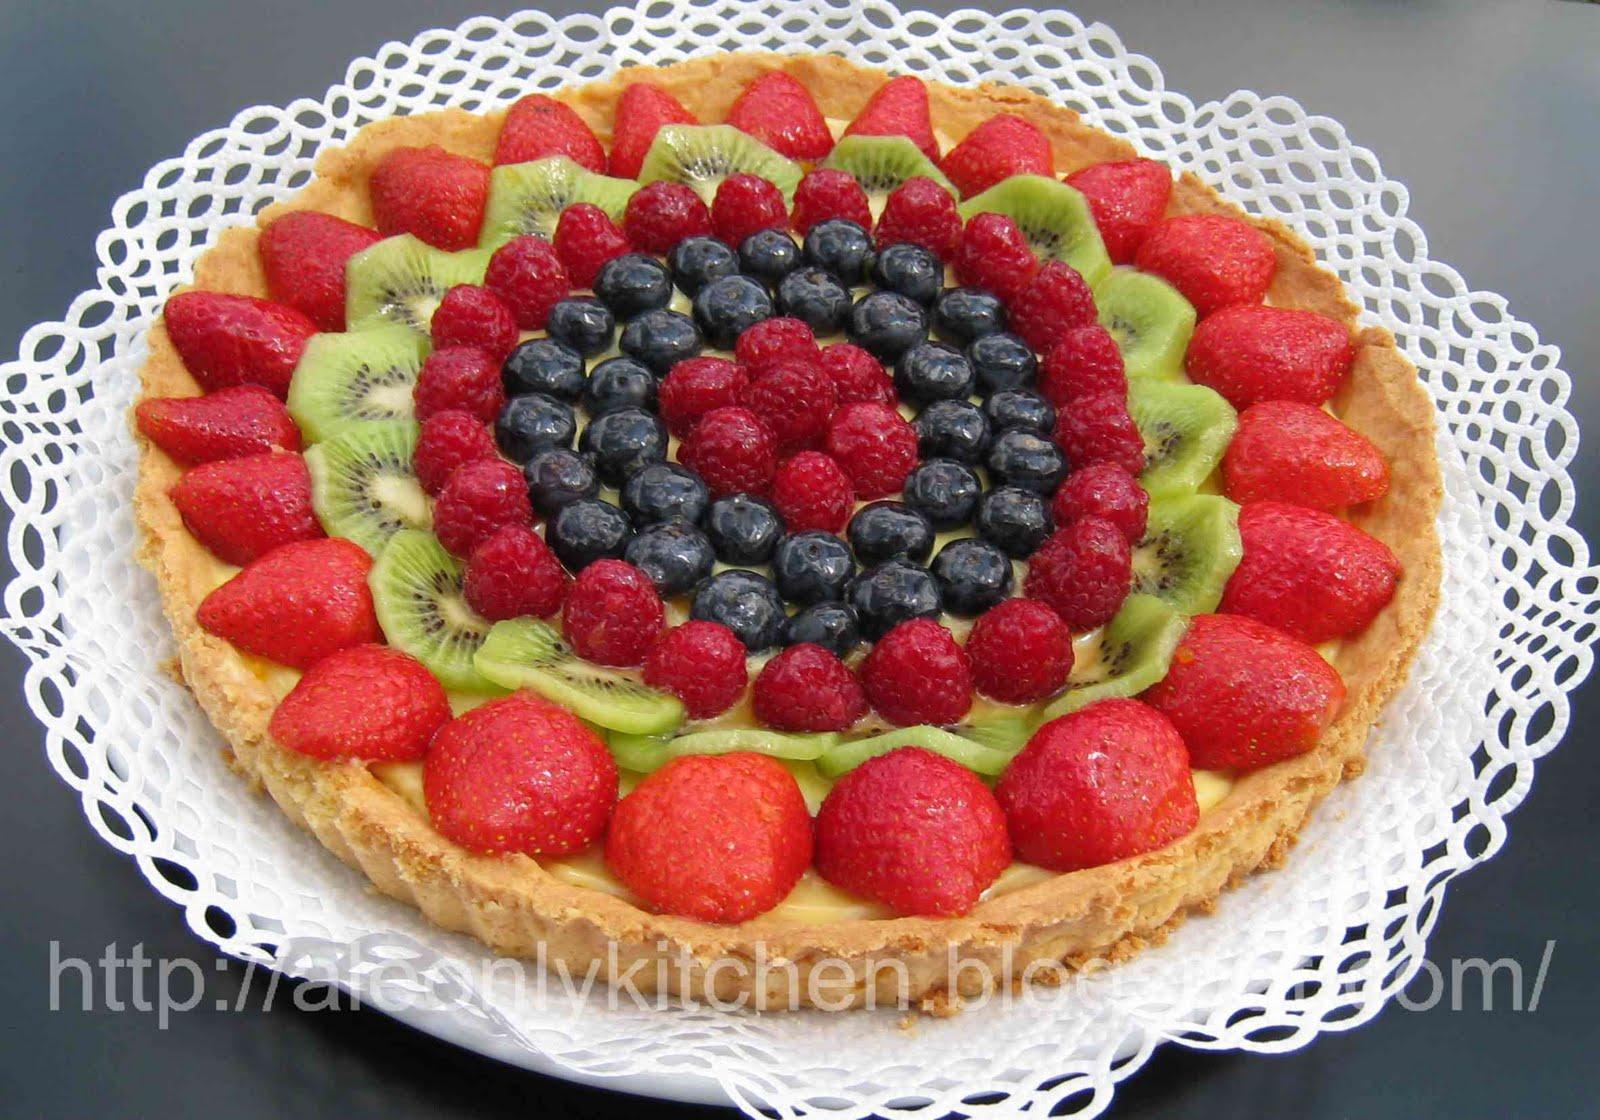 Préférence Ale only kitchen: Crostata di frutta fresca HN53